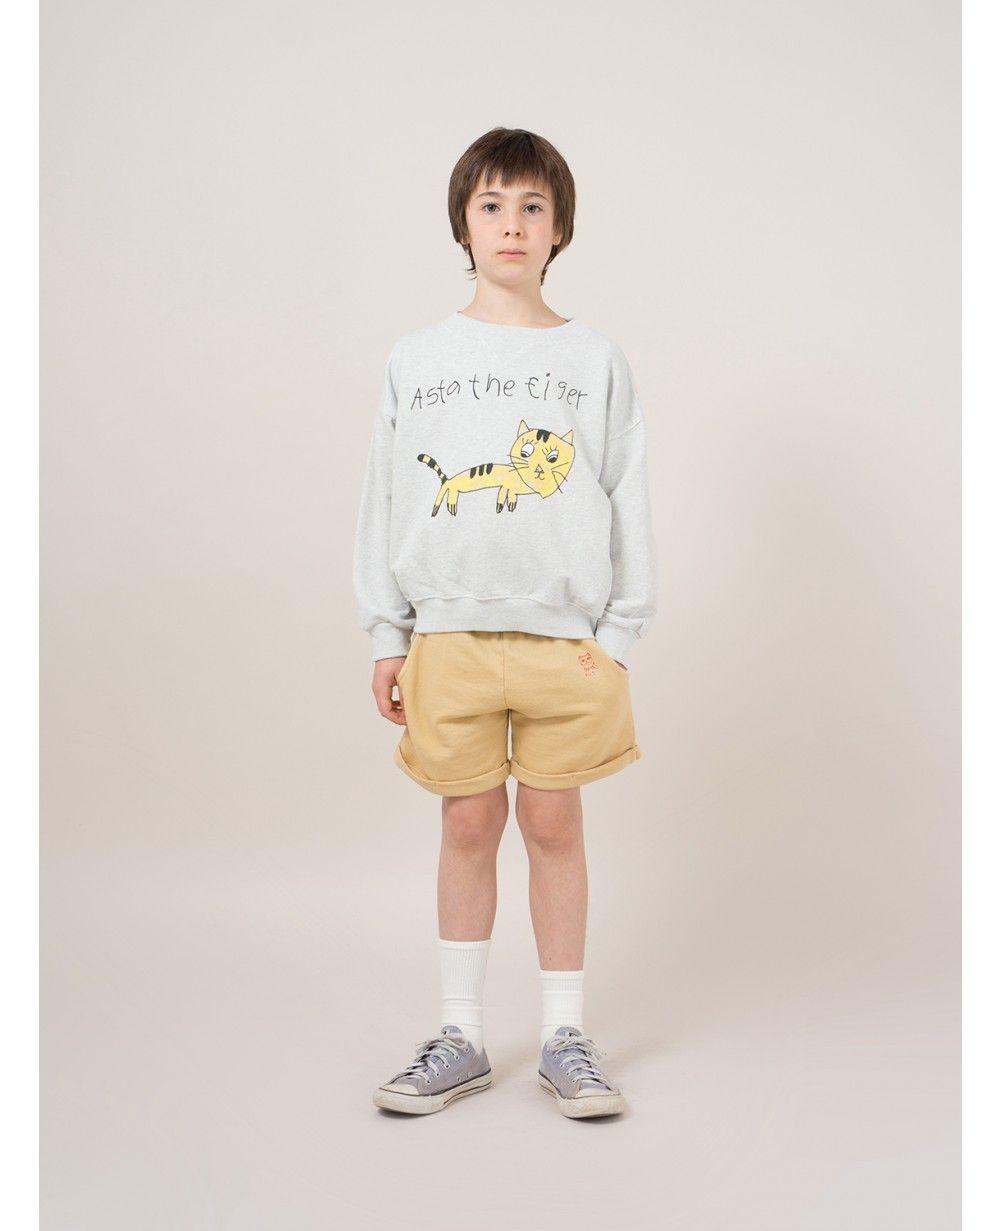 Kinderkleding Webshop.Grey Tiger Sweatshirt Bobo Choses Online Baby Kids Teens